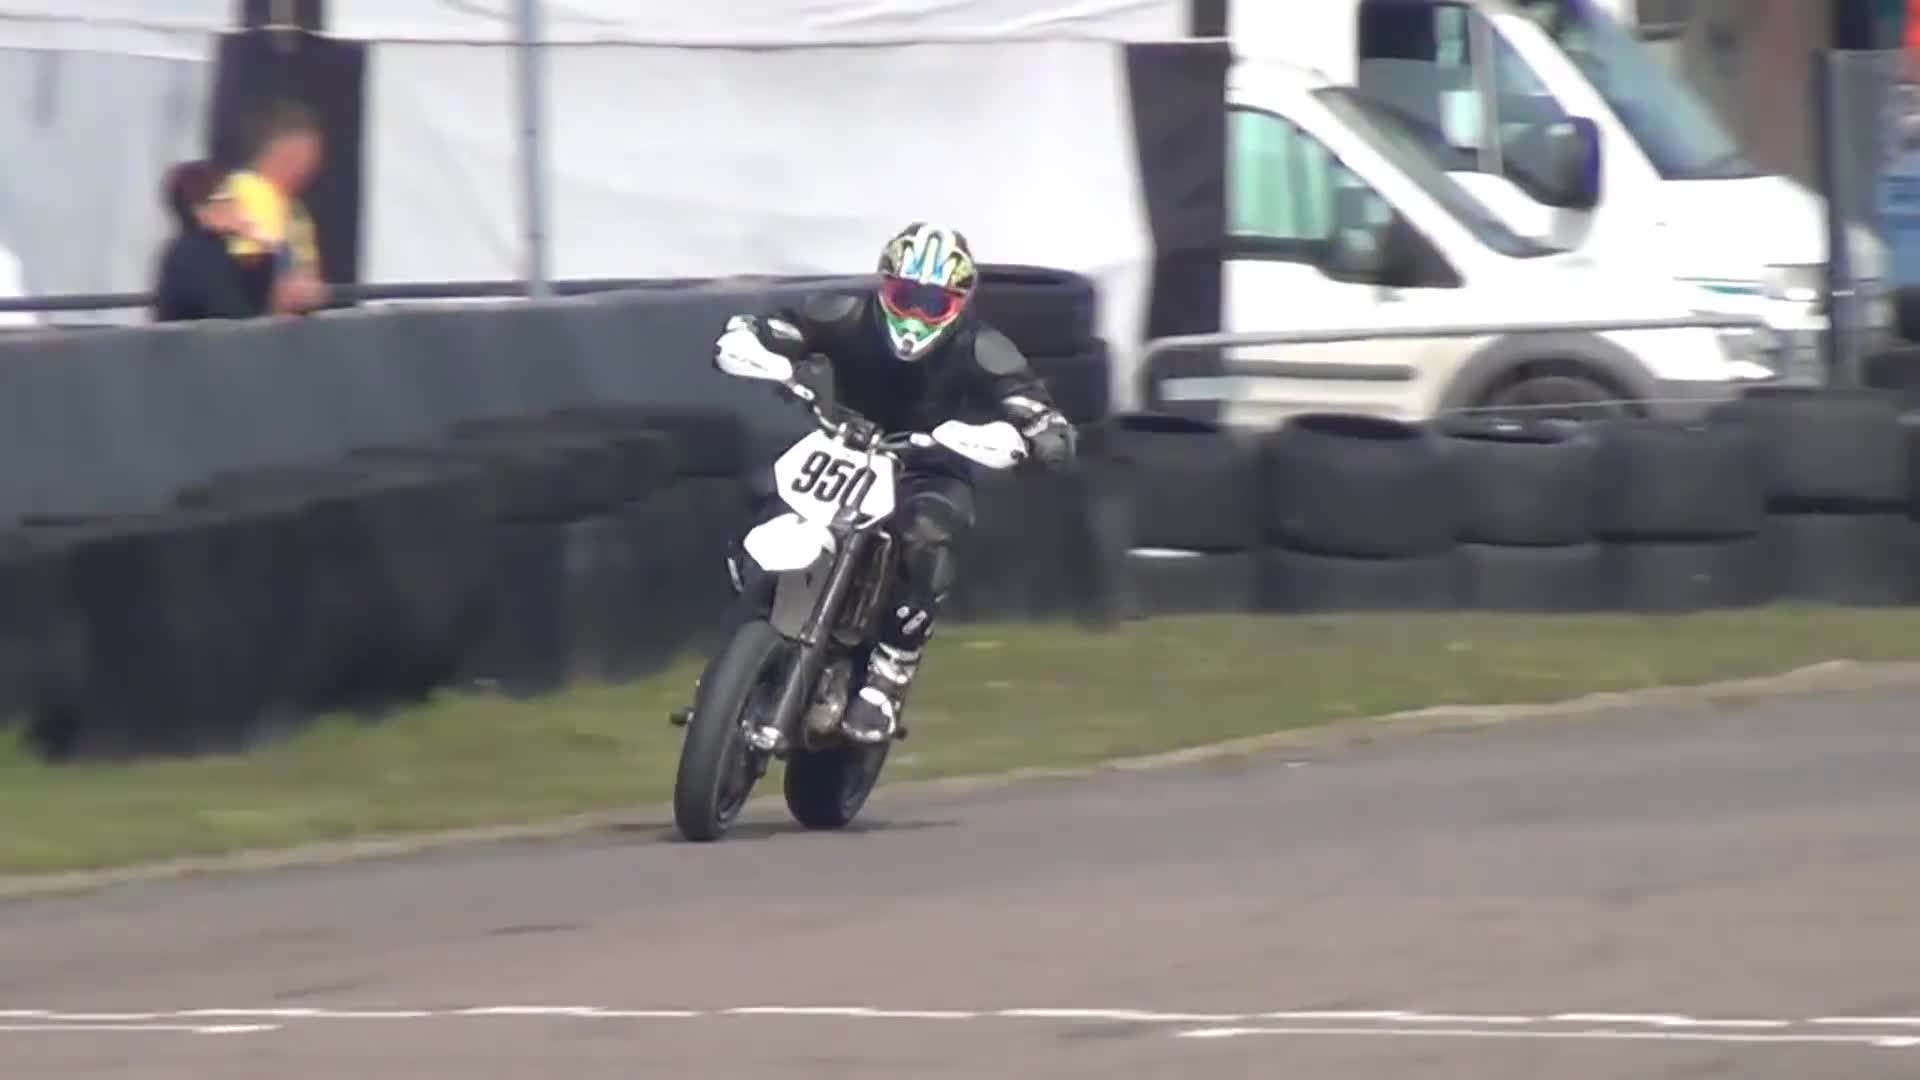 Bikes, British, Dirt, GP, Moto, Motorcycle, Motorsport, Racing, Supermotard, Supermoto, BRITISH SUPERMOTO OPEN ELITE CHAMPIONSHIP 2014 R1 - LYDD GIFs